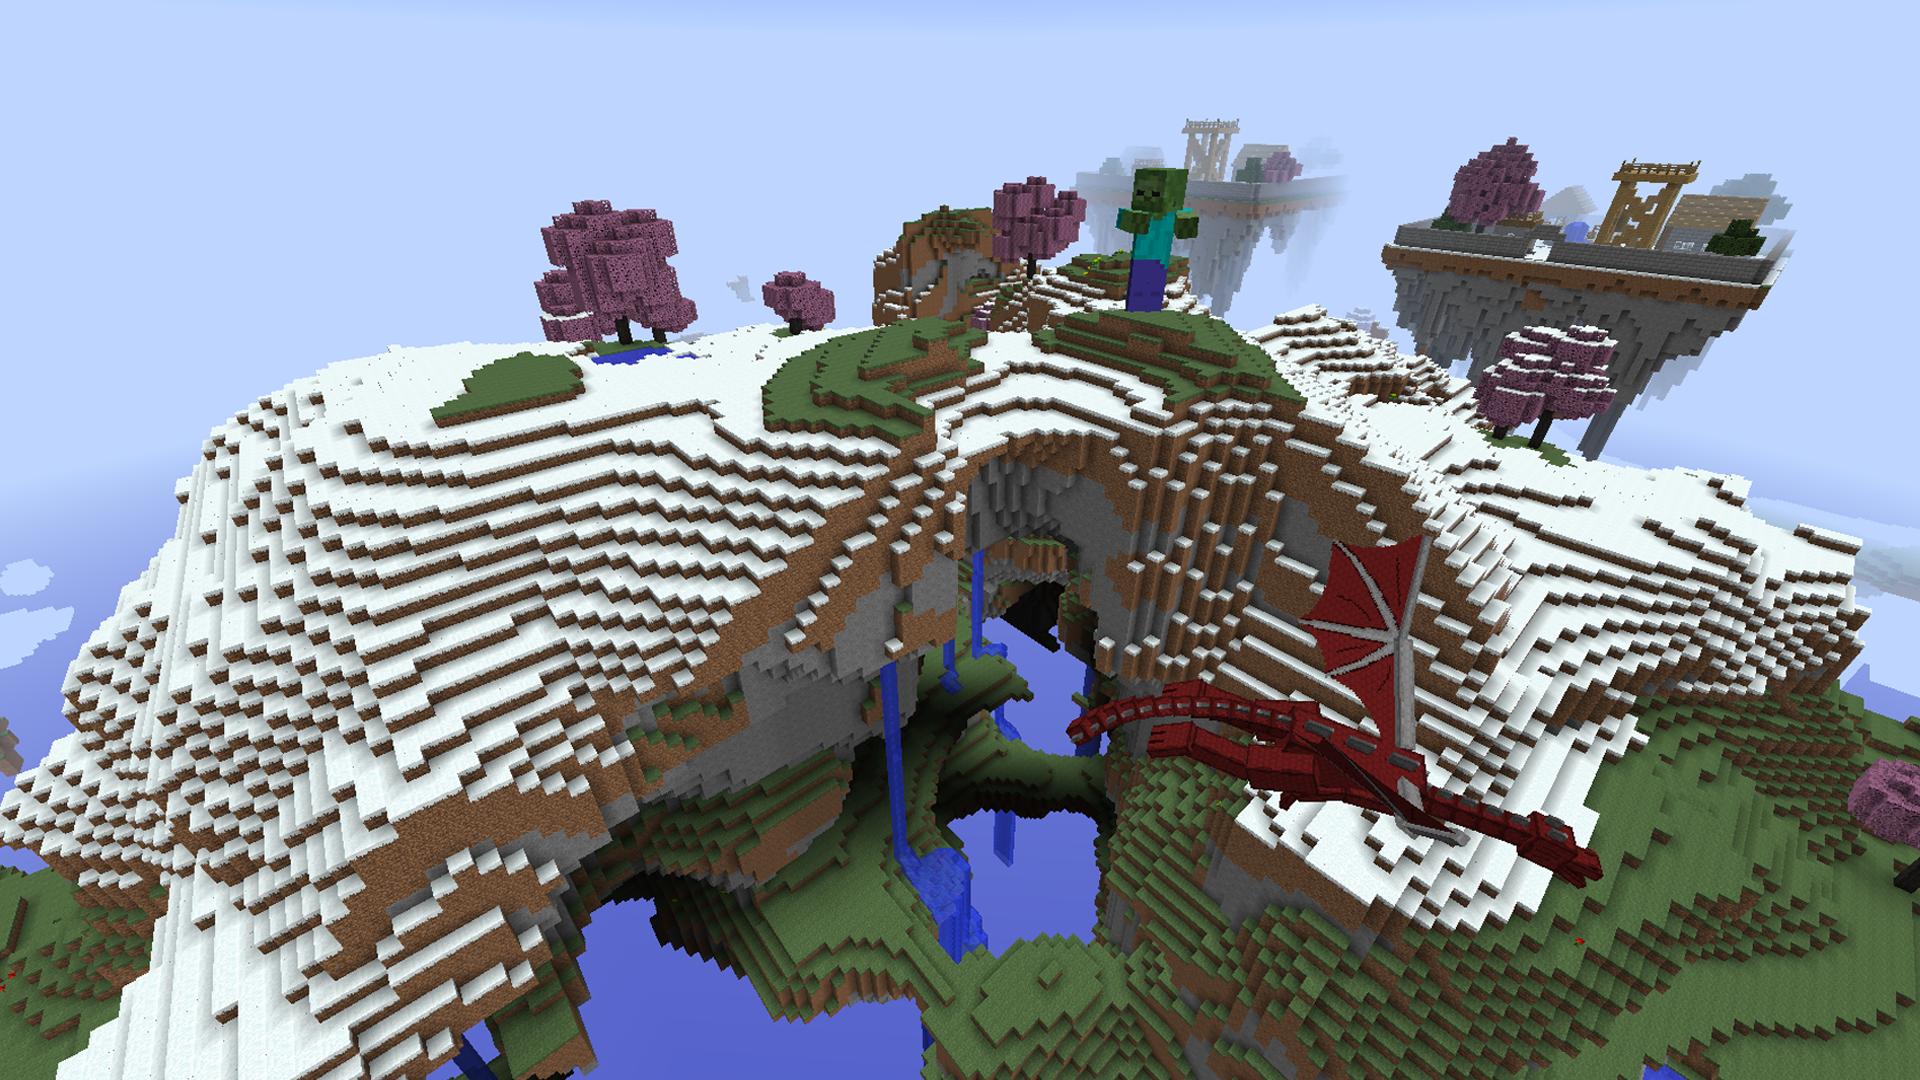 Minecraft diamond dimensions mods | The Diamond Dimensions Mod Pack